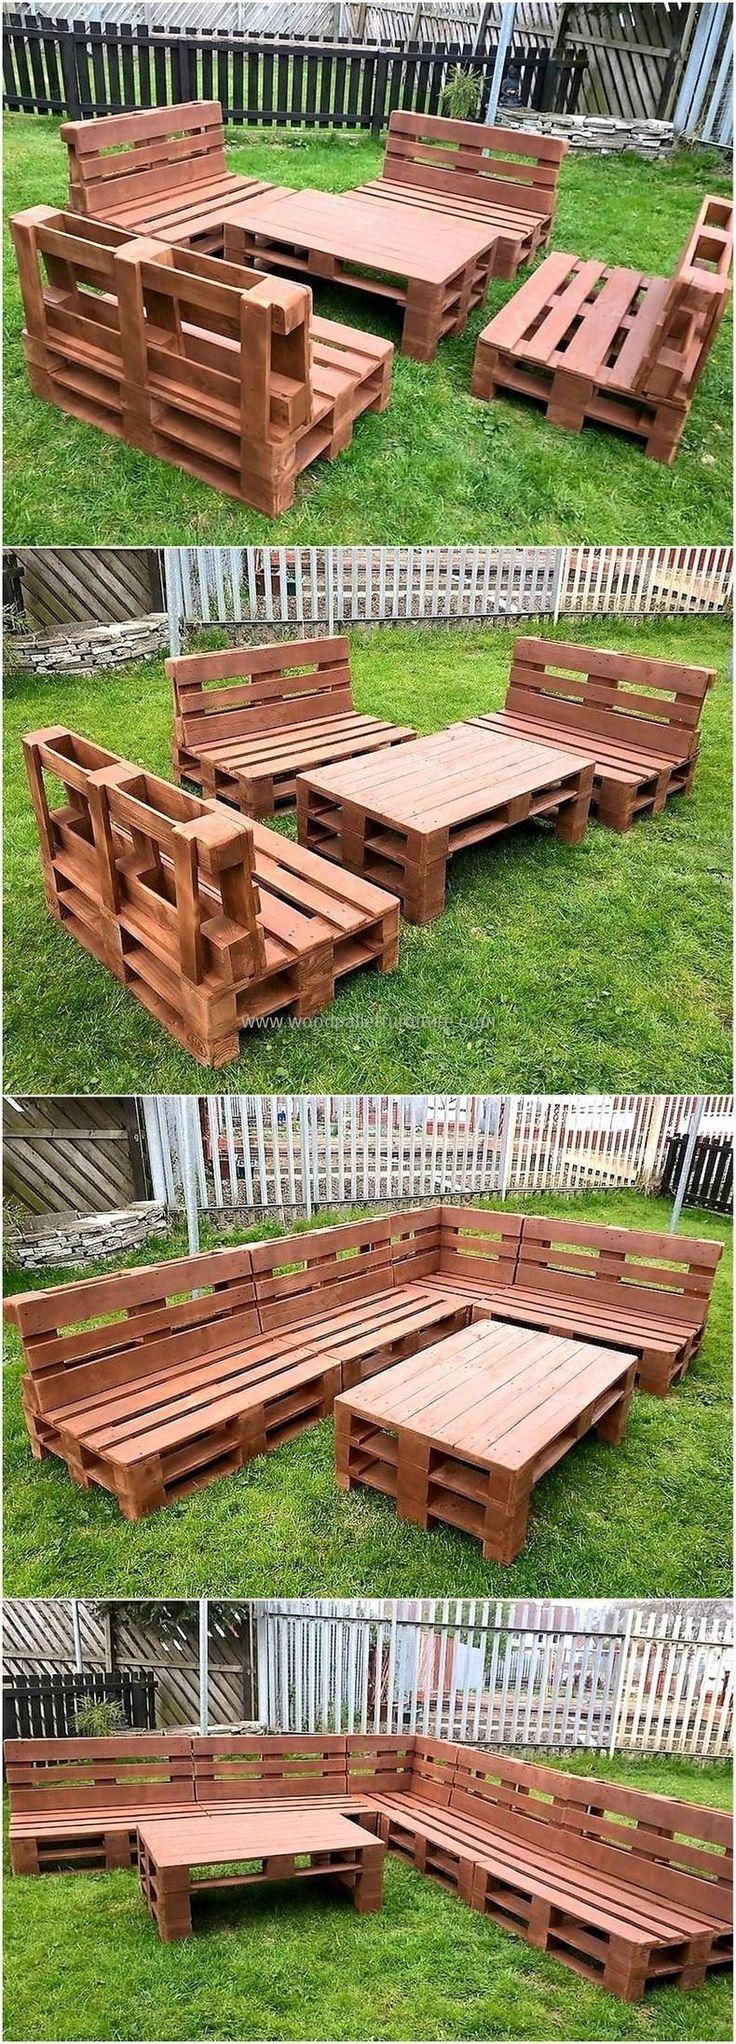 pallets garden furniture project DIY in Pinterest Pallet